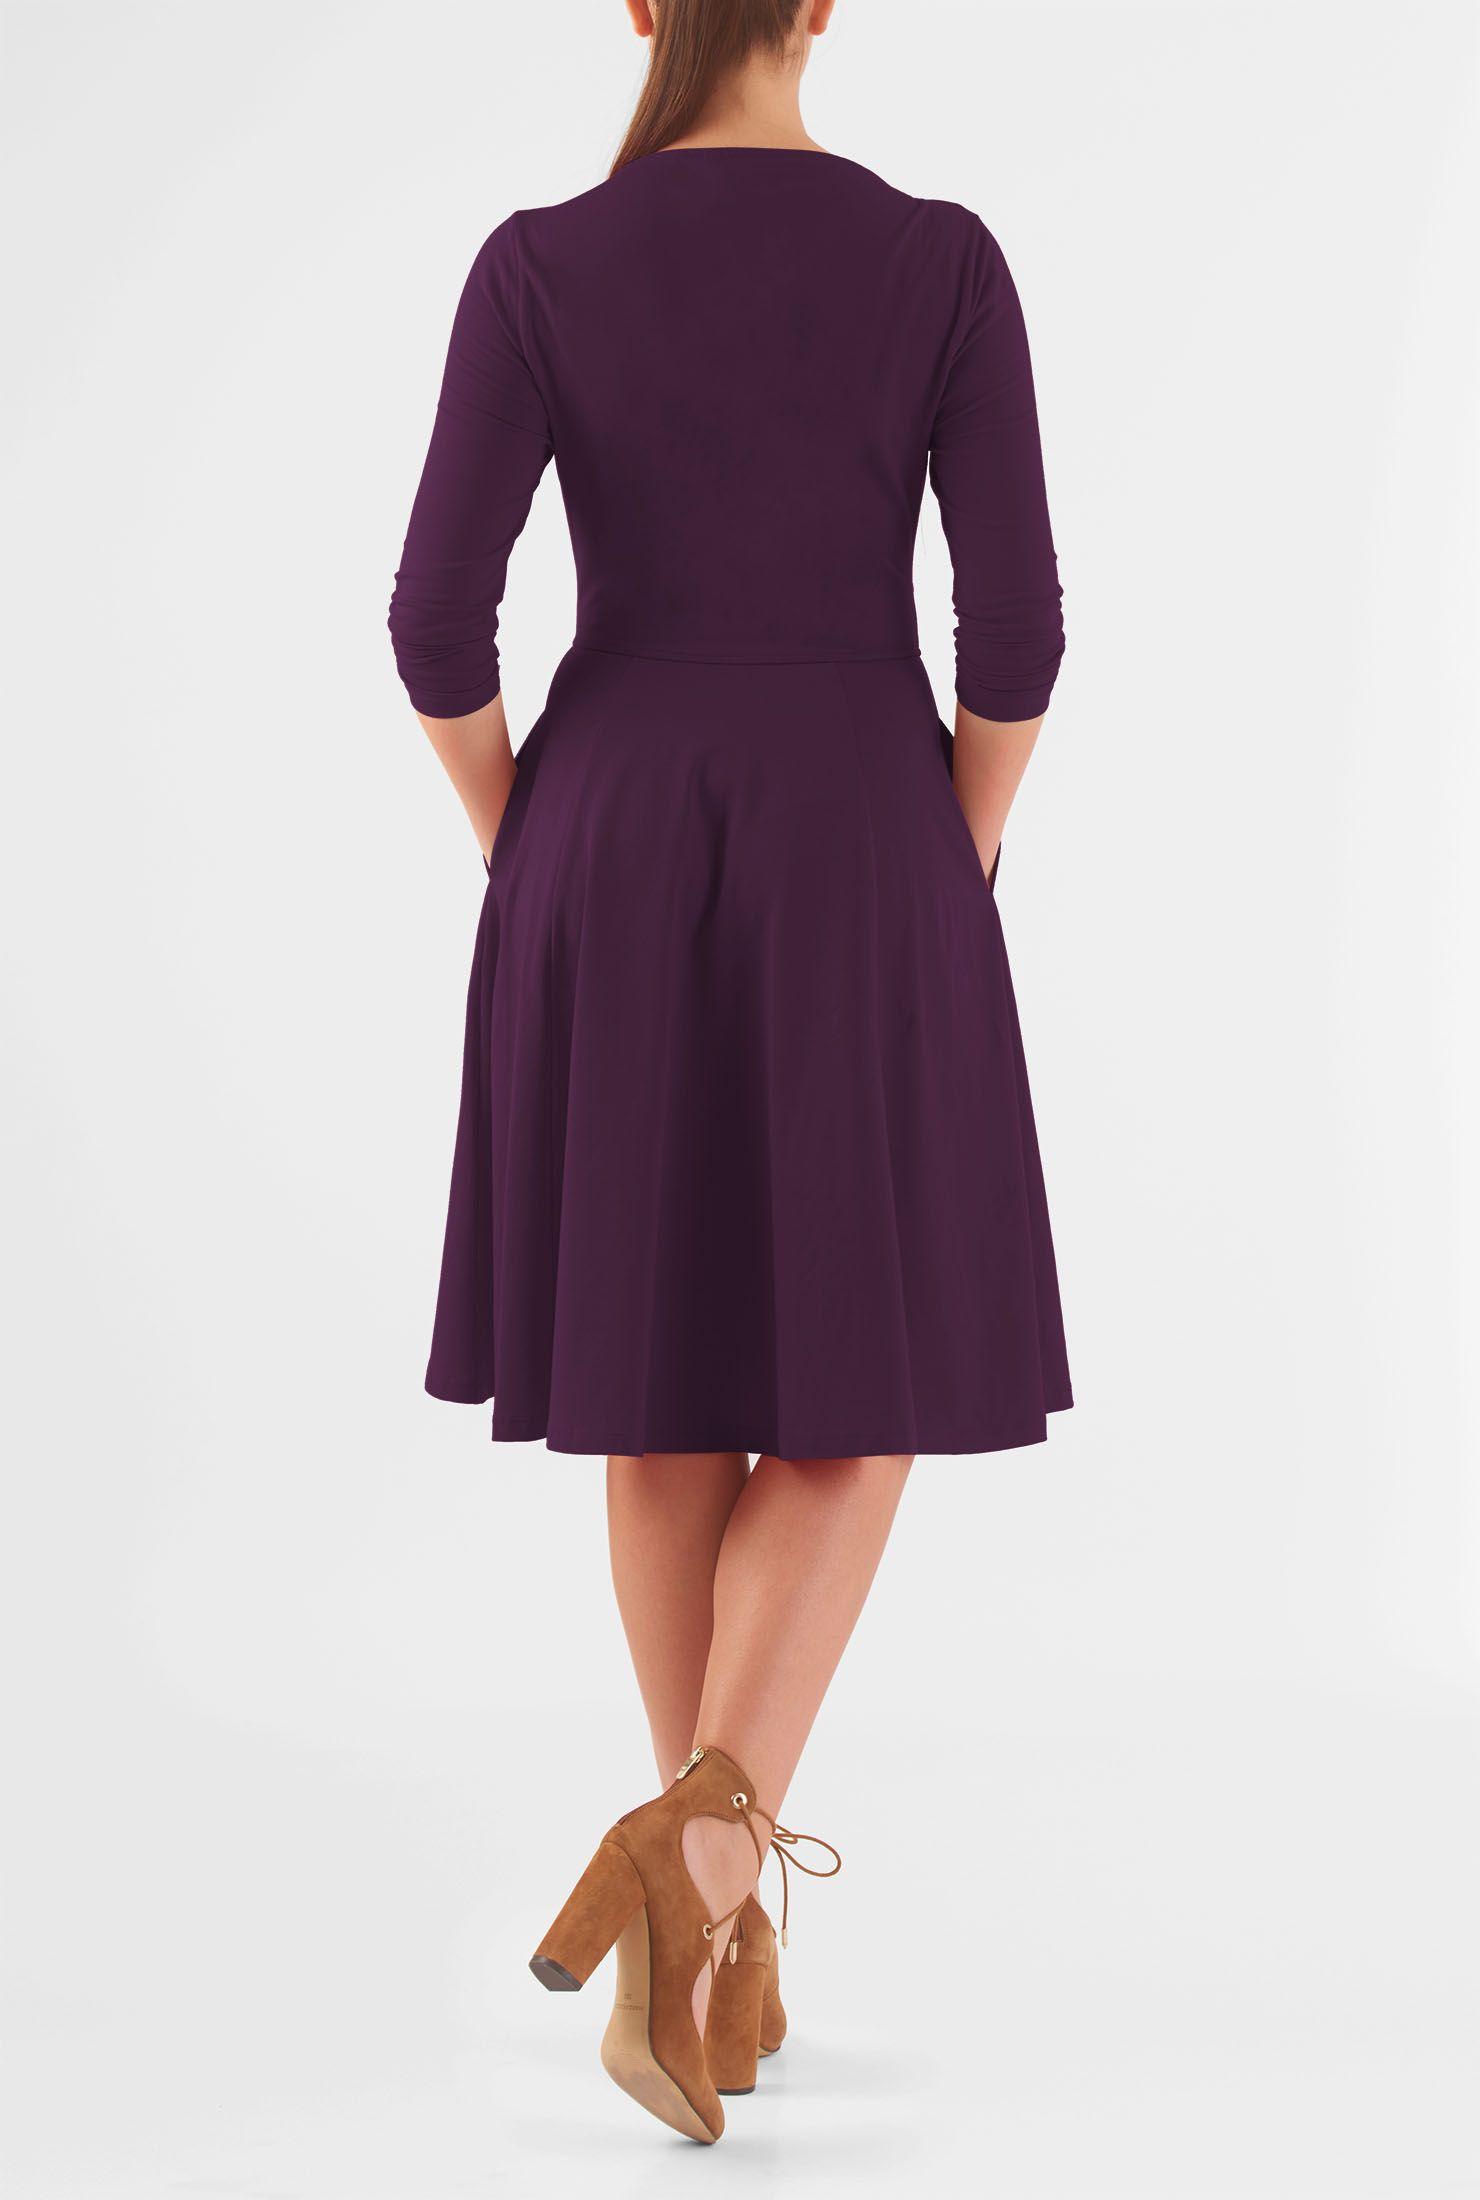 Below knee length dresses boat neck dresses cottonspandex dresses